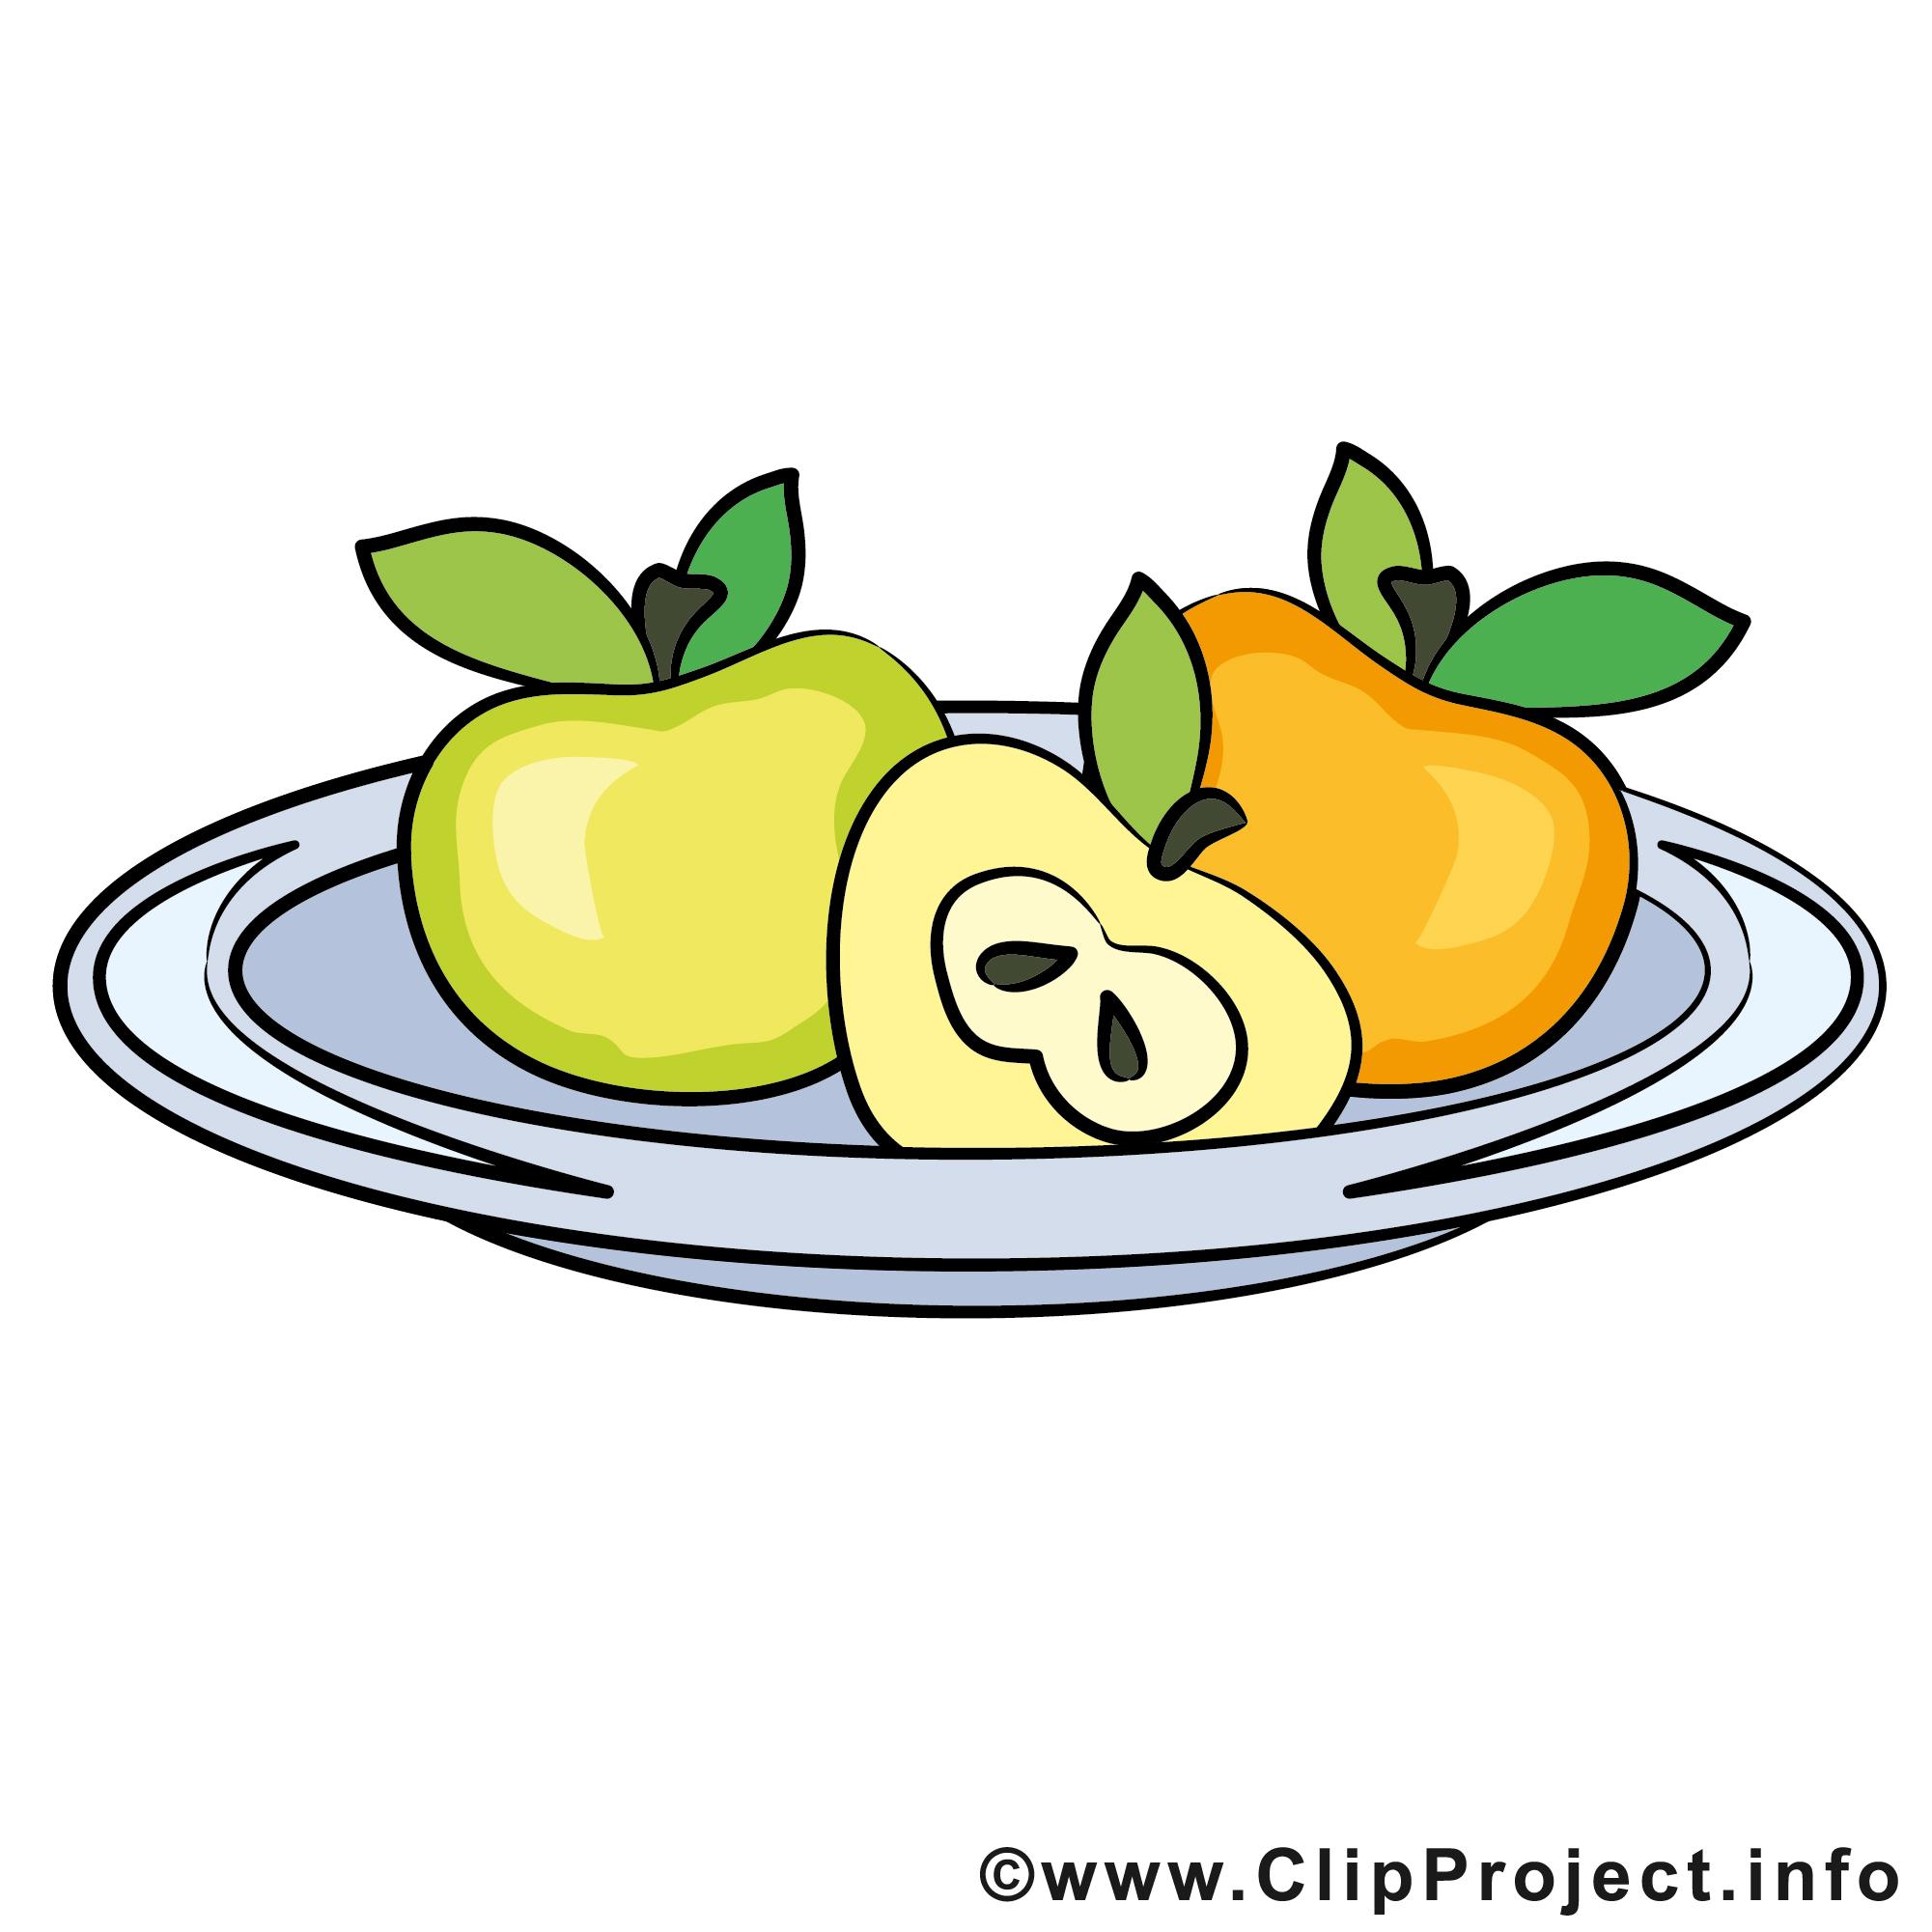 Obst auf dem Tablett.